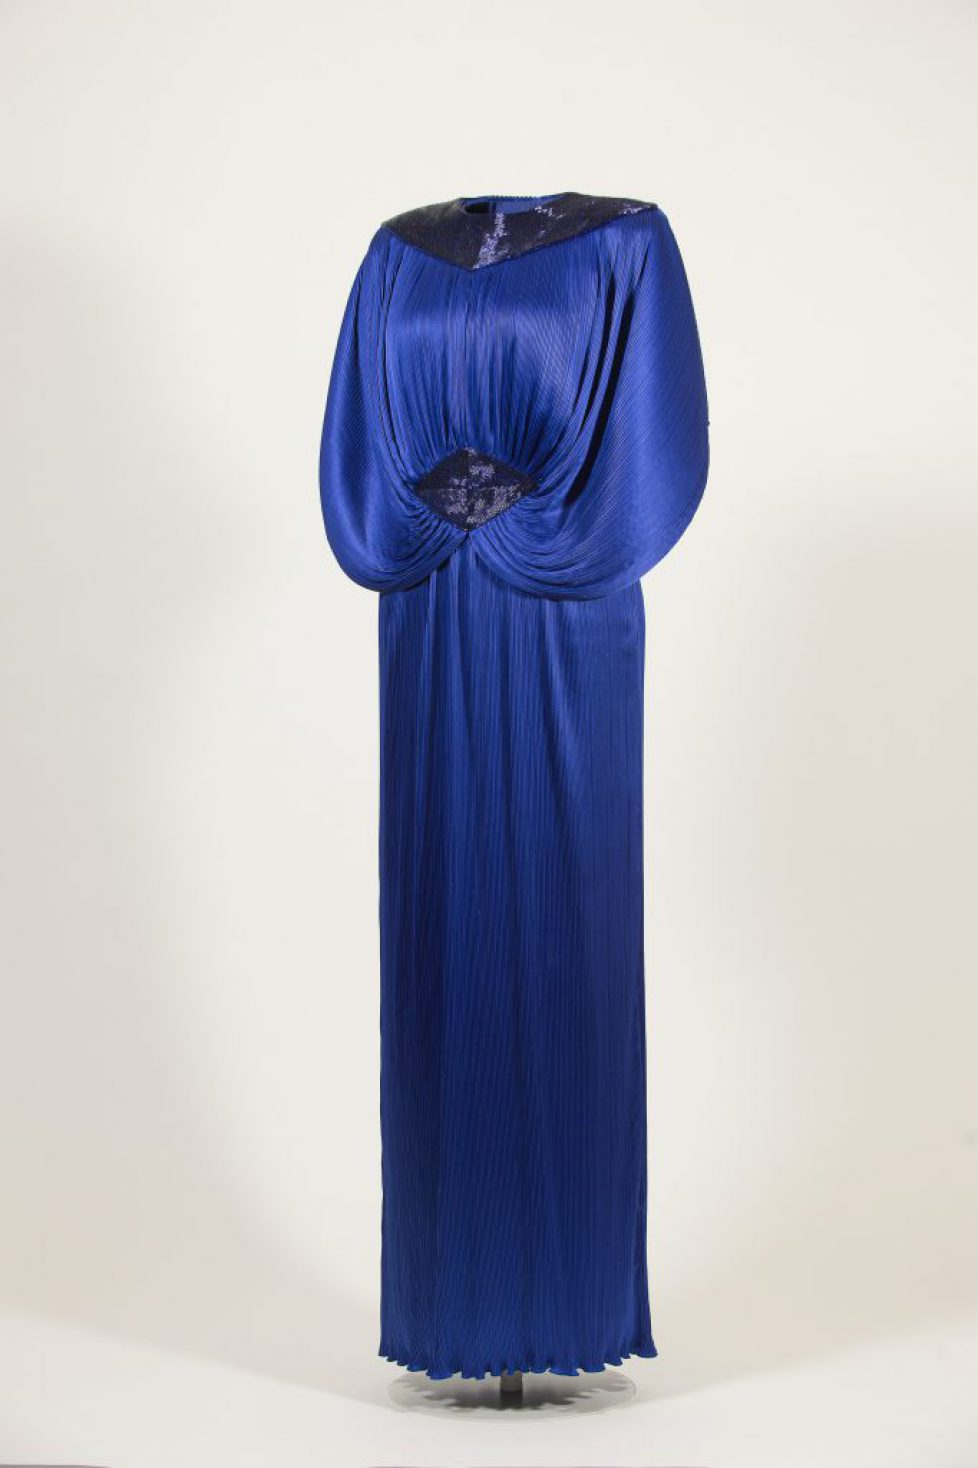 SWNS_HRP_DIANA DRESSES_020